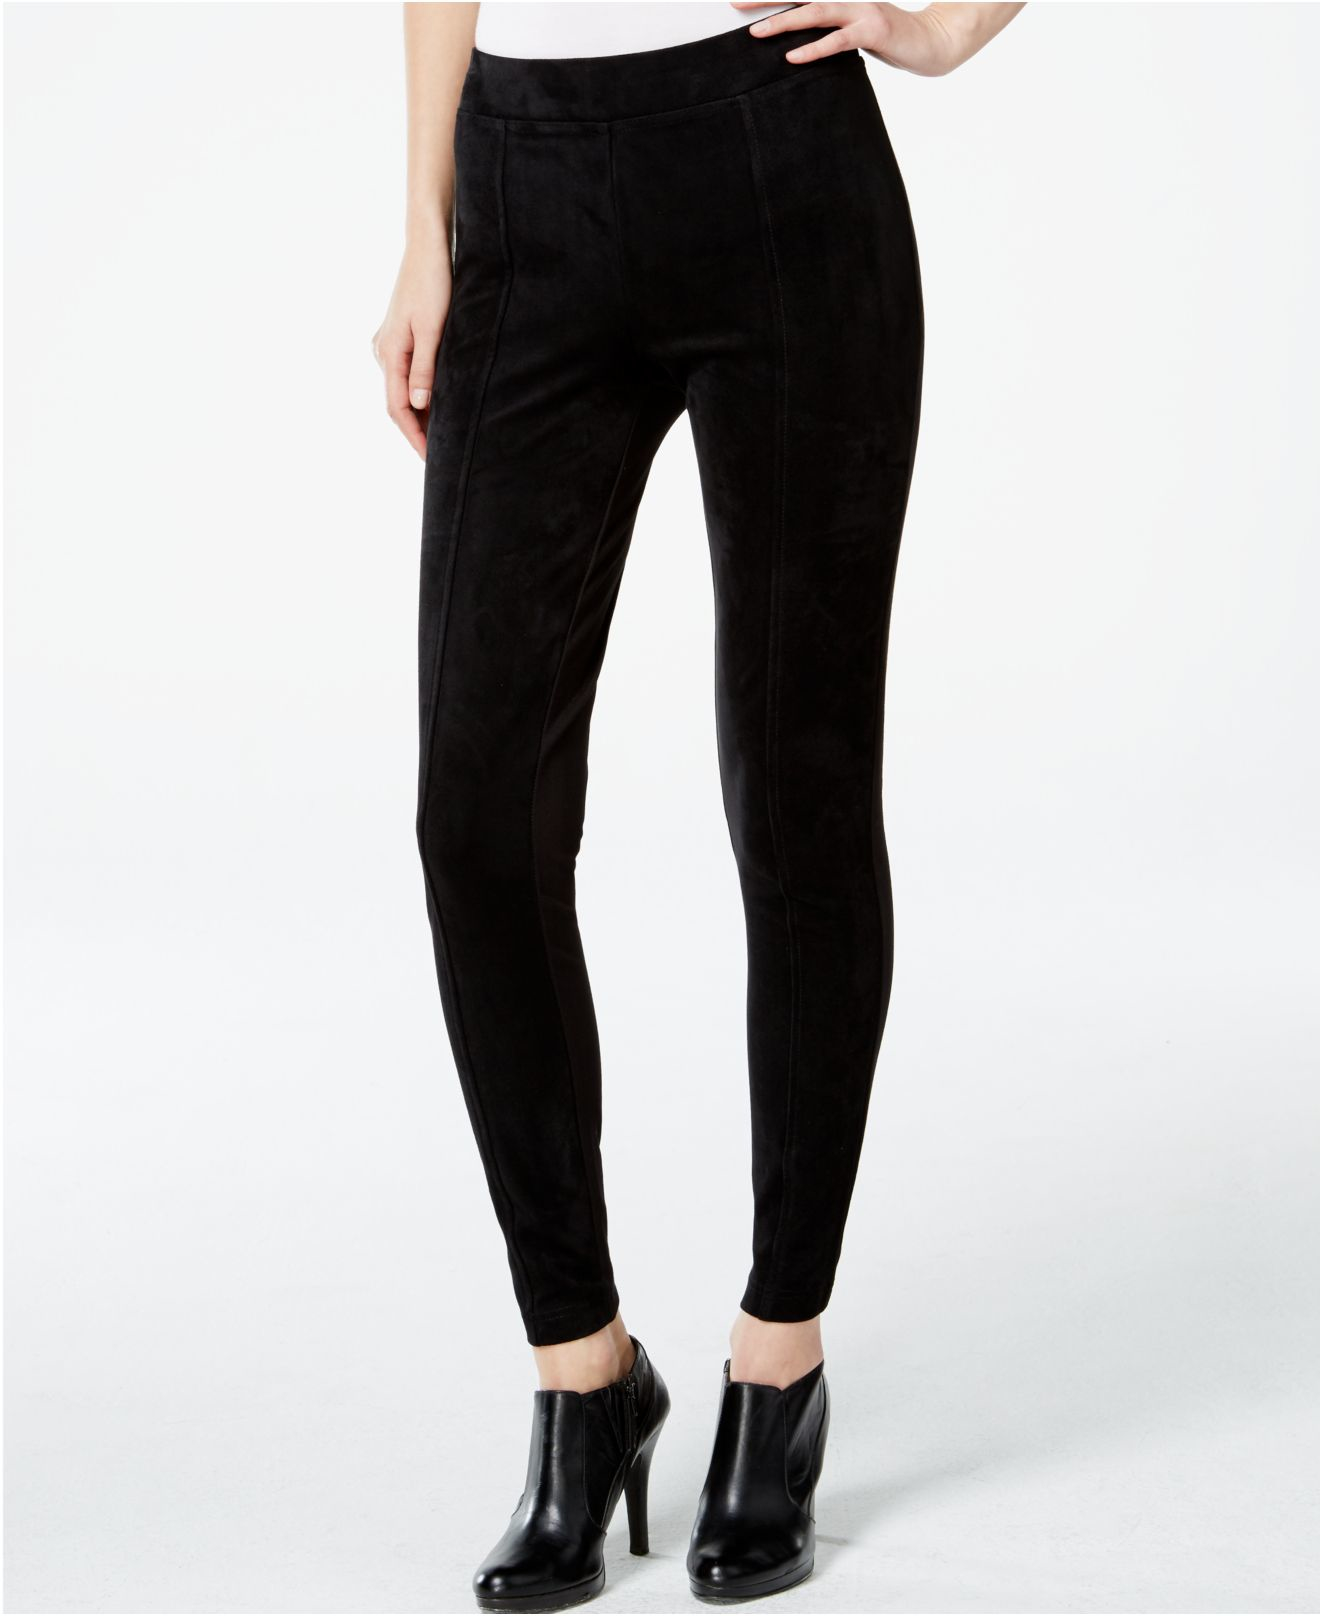 calvin klein faux suede front seamed leggings in black lyst. Black Bedroom Furniture Sets. Home Design Ideas